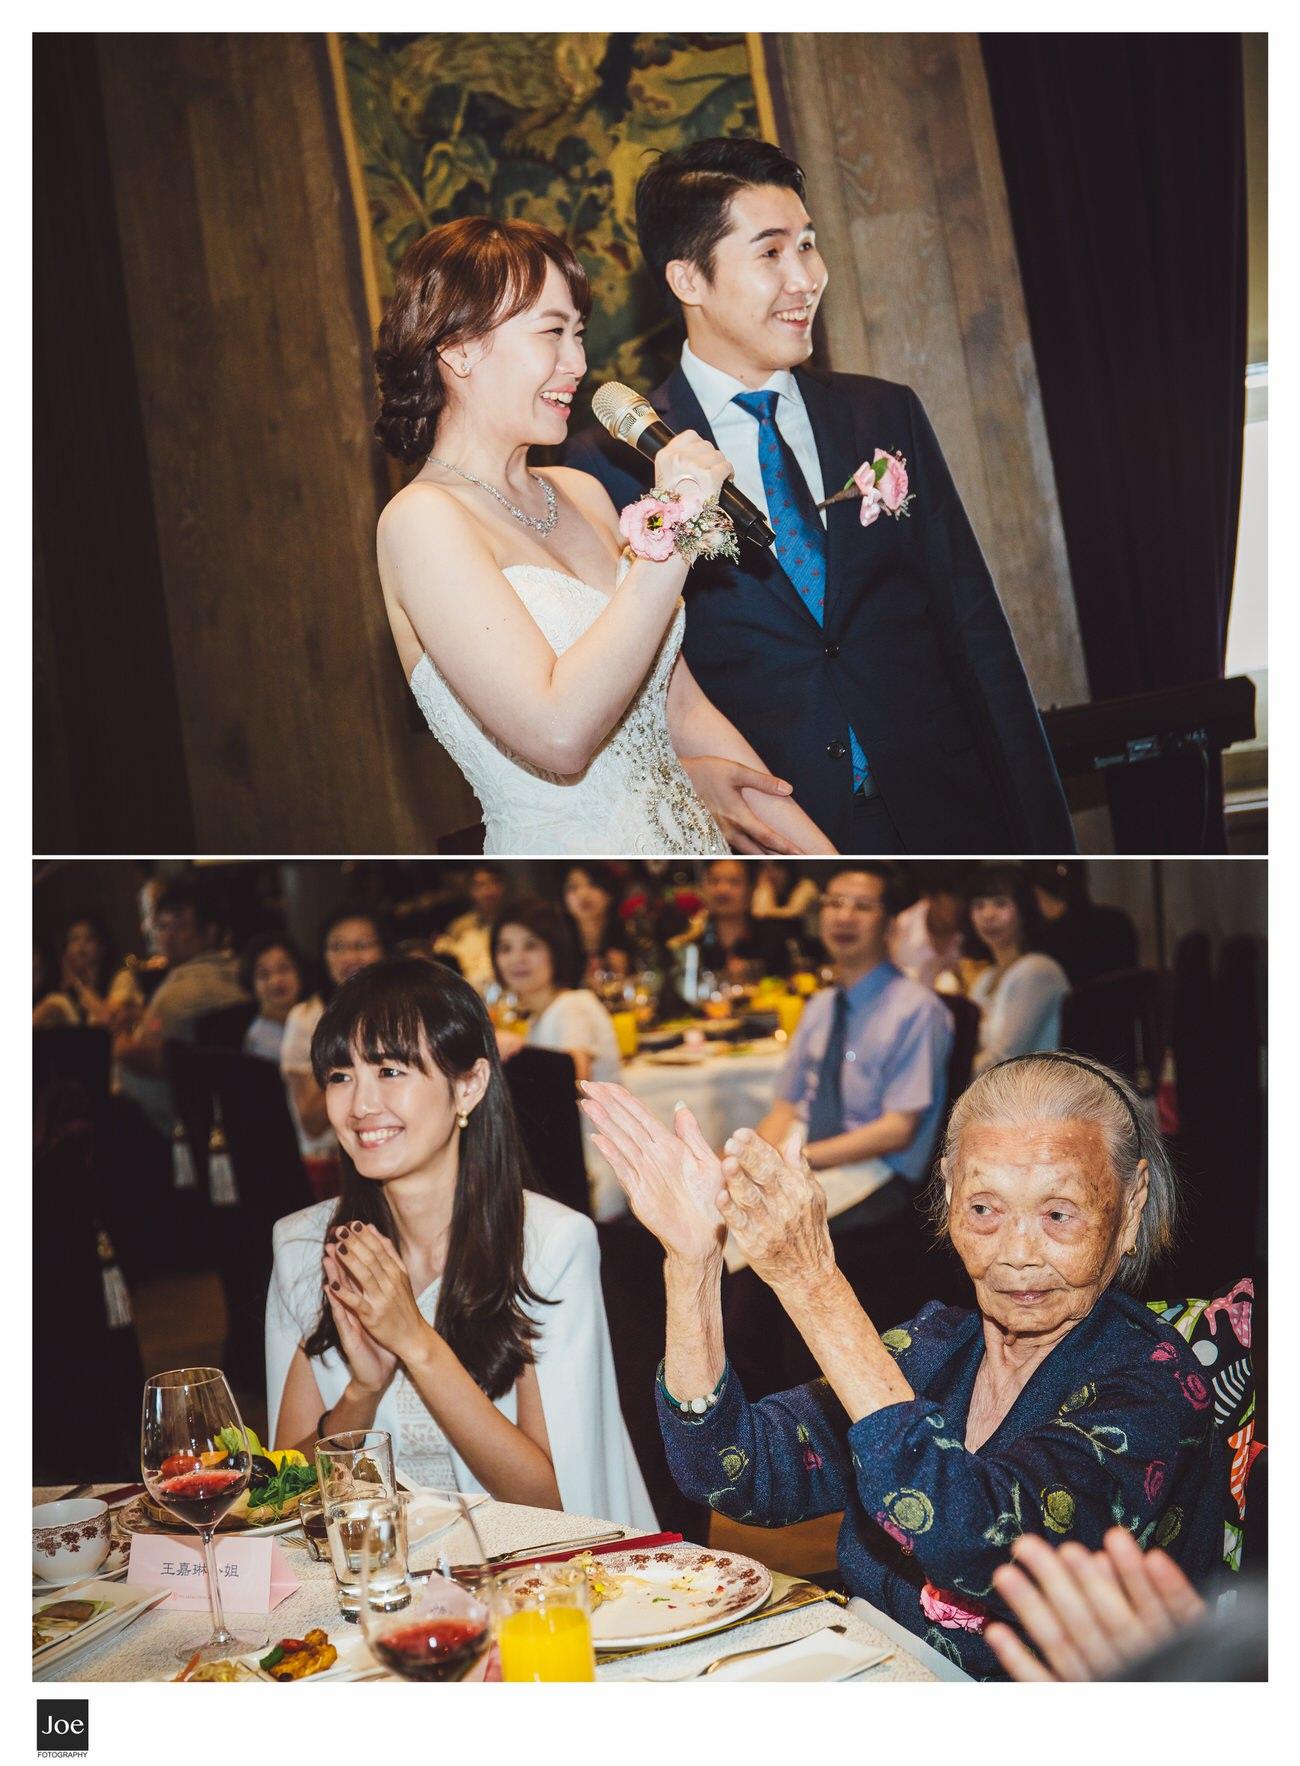 joe-fotography-wedding-photo-palais-de-chine-hotel-031.jpg